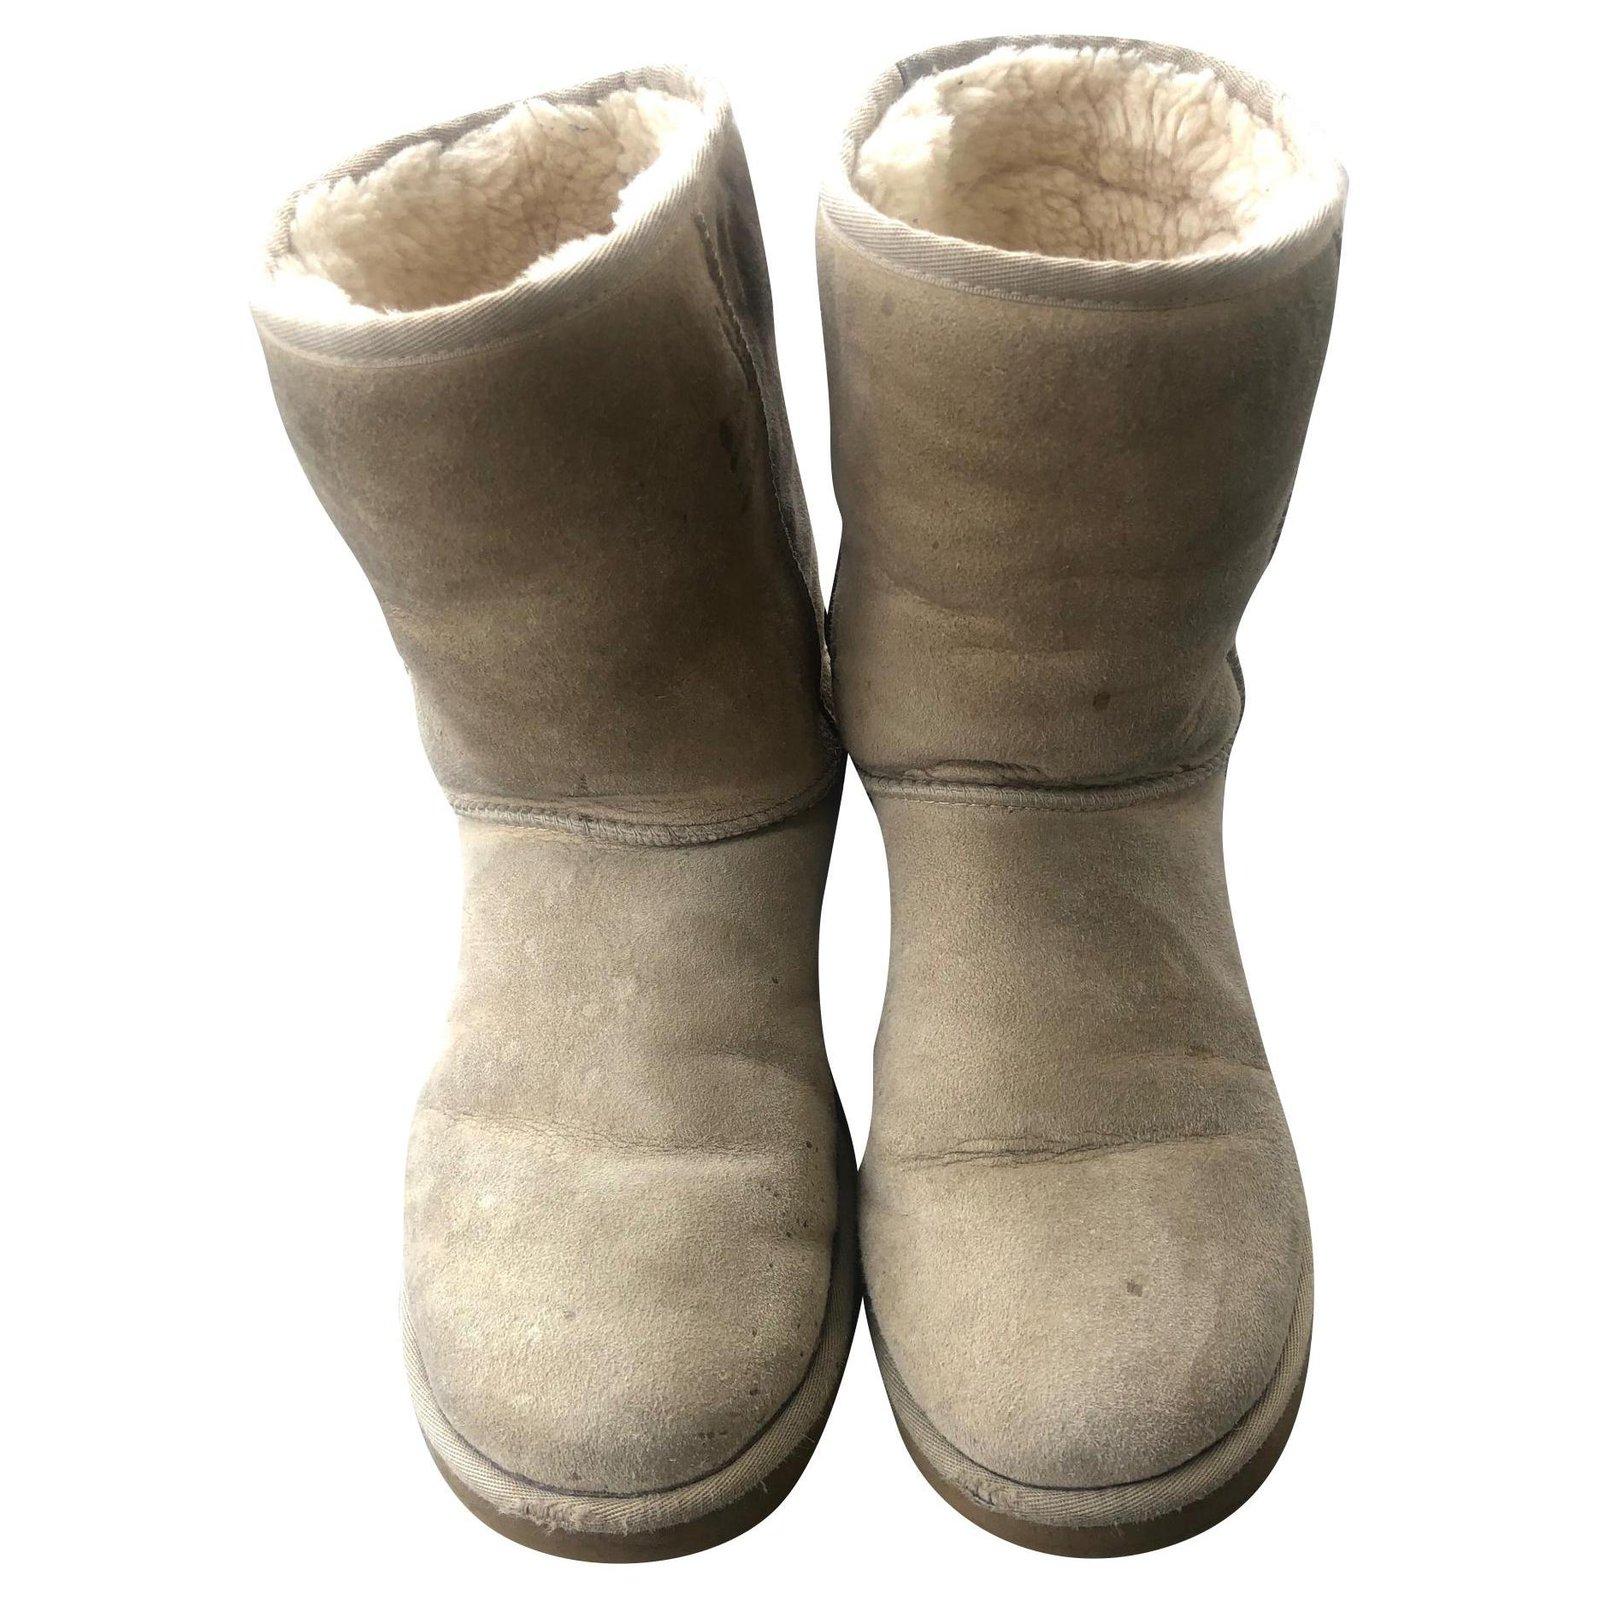 Ugg Boots Ugg Classic short Beige Boots